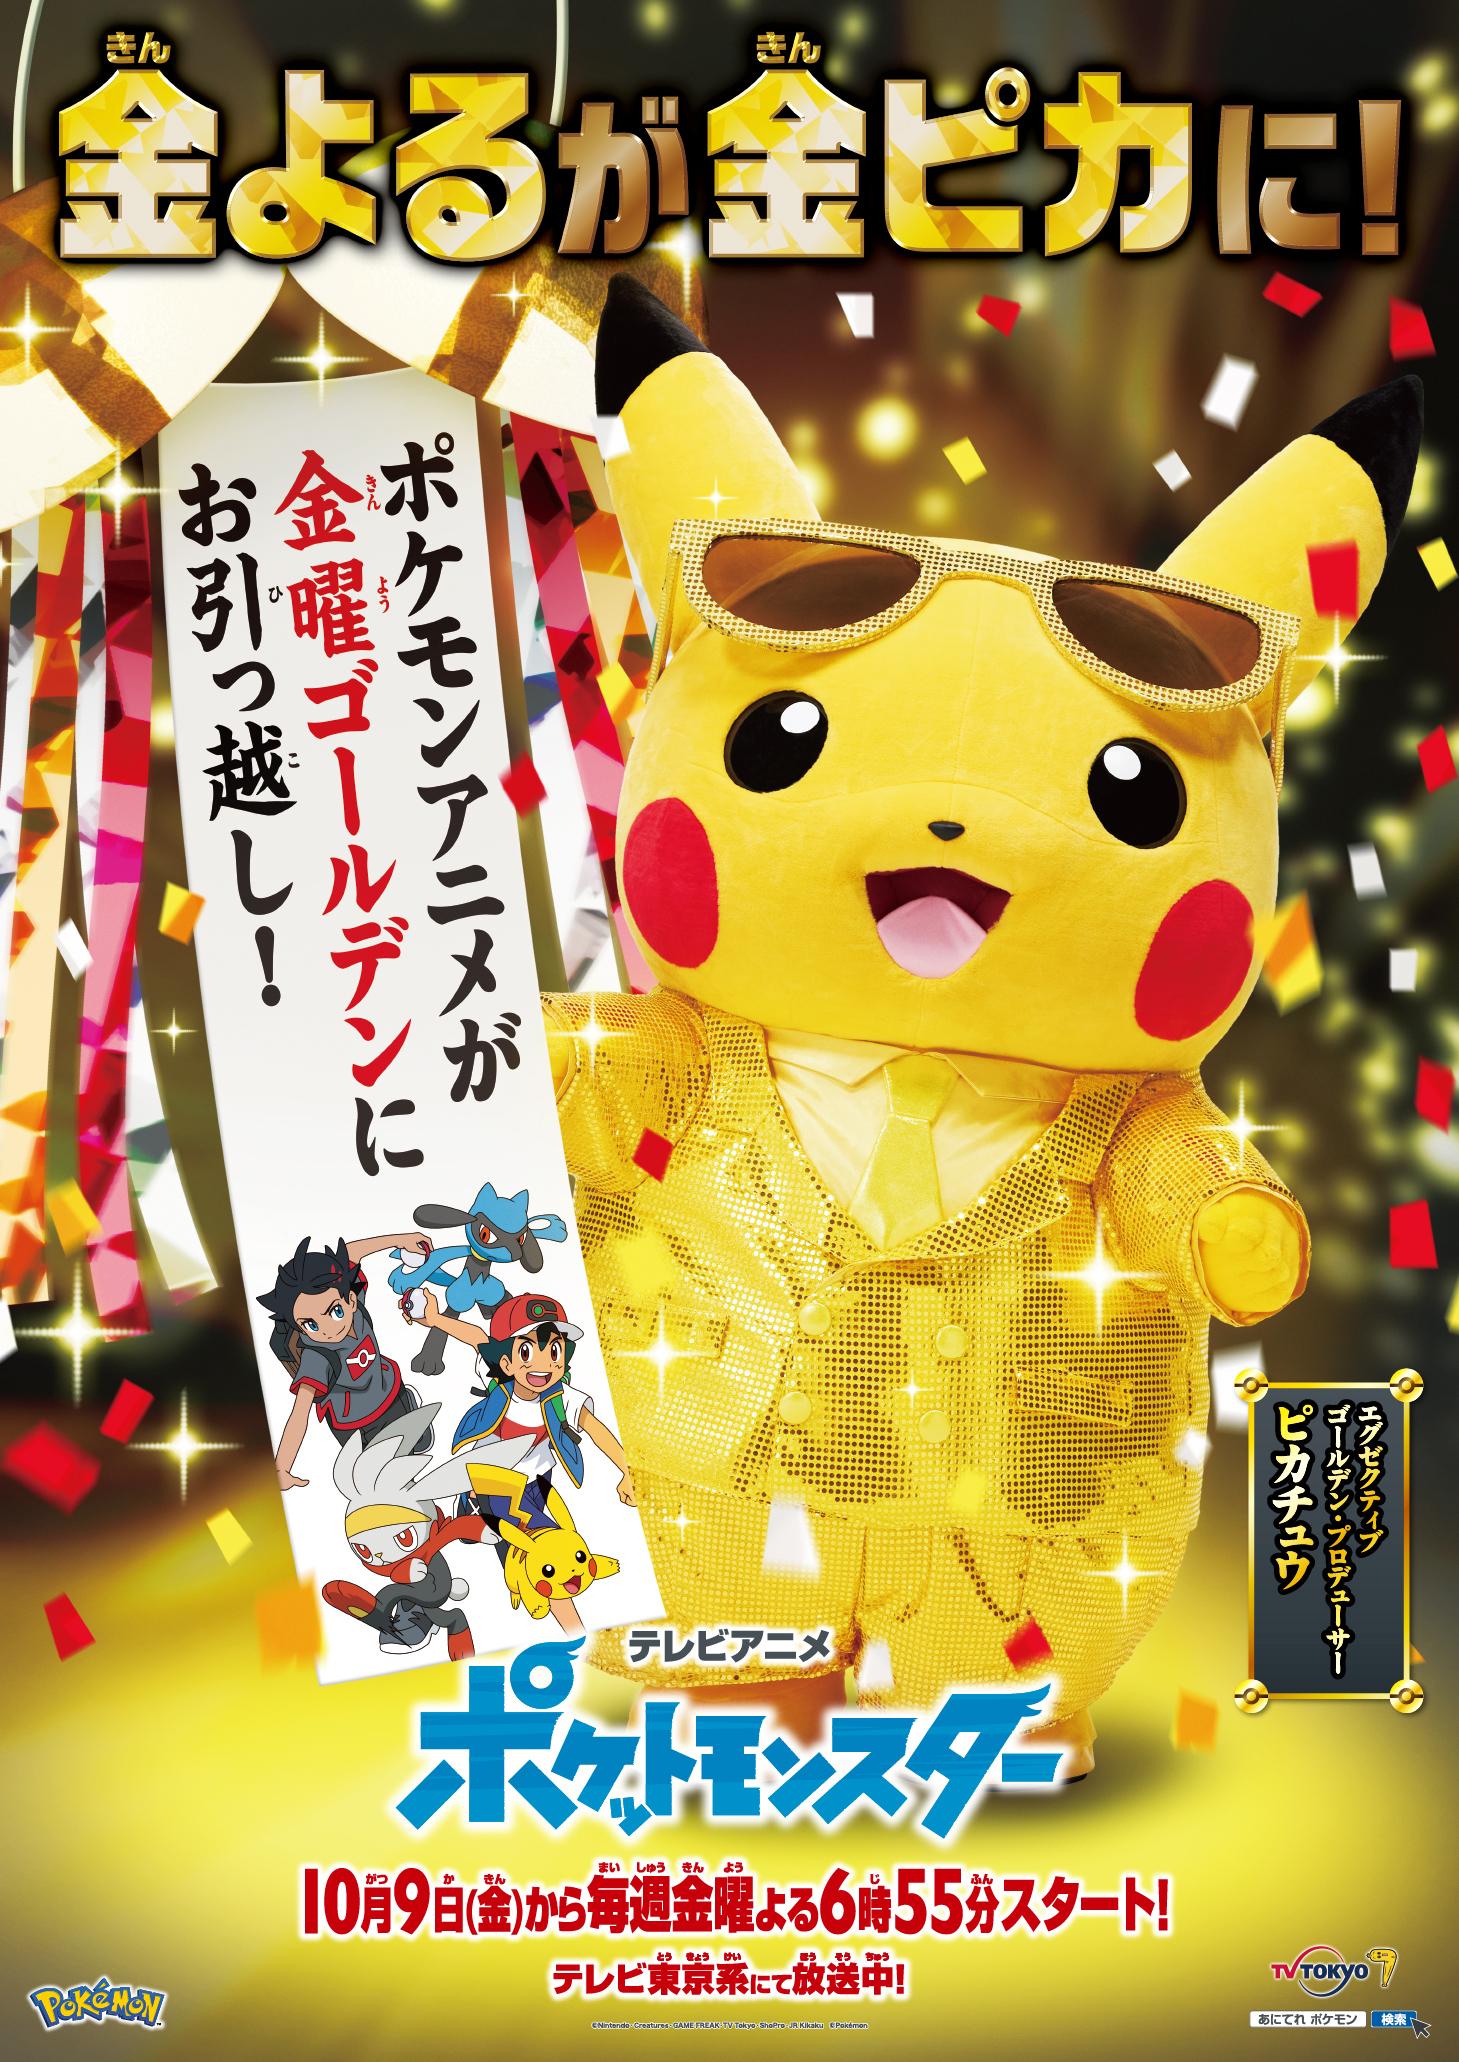 TVアニメ『ポケモン』金曜ゴールデンにお引越し!「アニポケ」初の視聴者参加型オンラインイベント開催決定